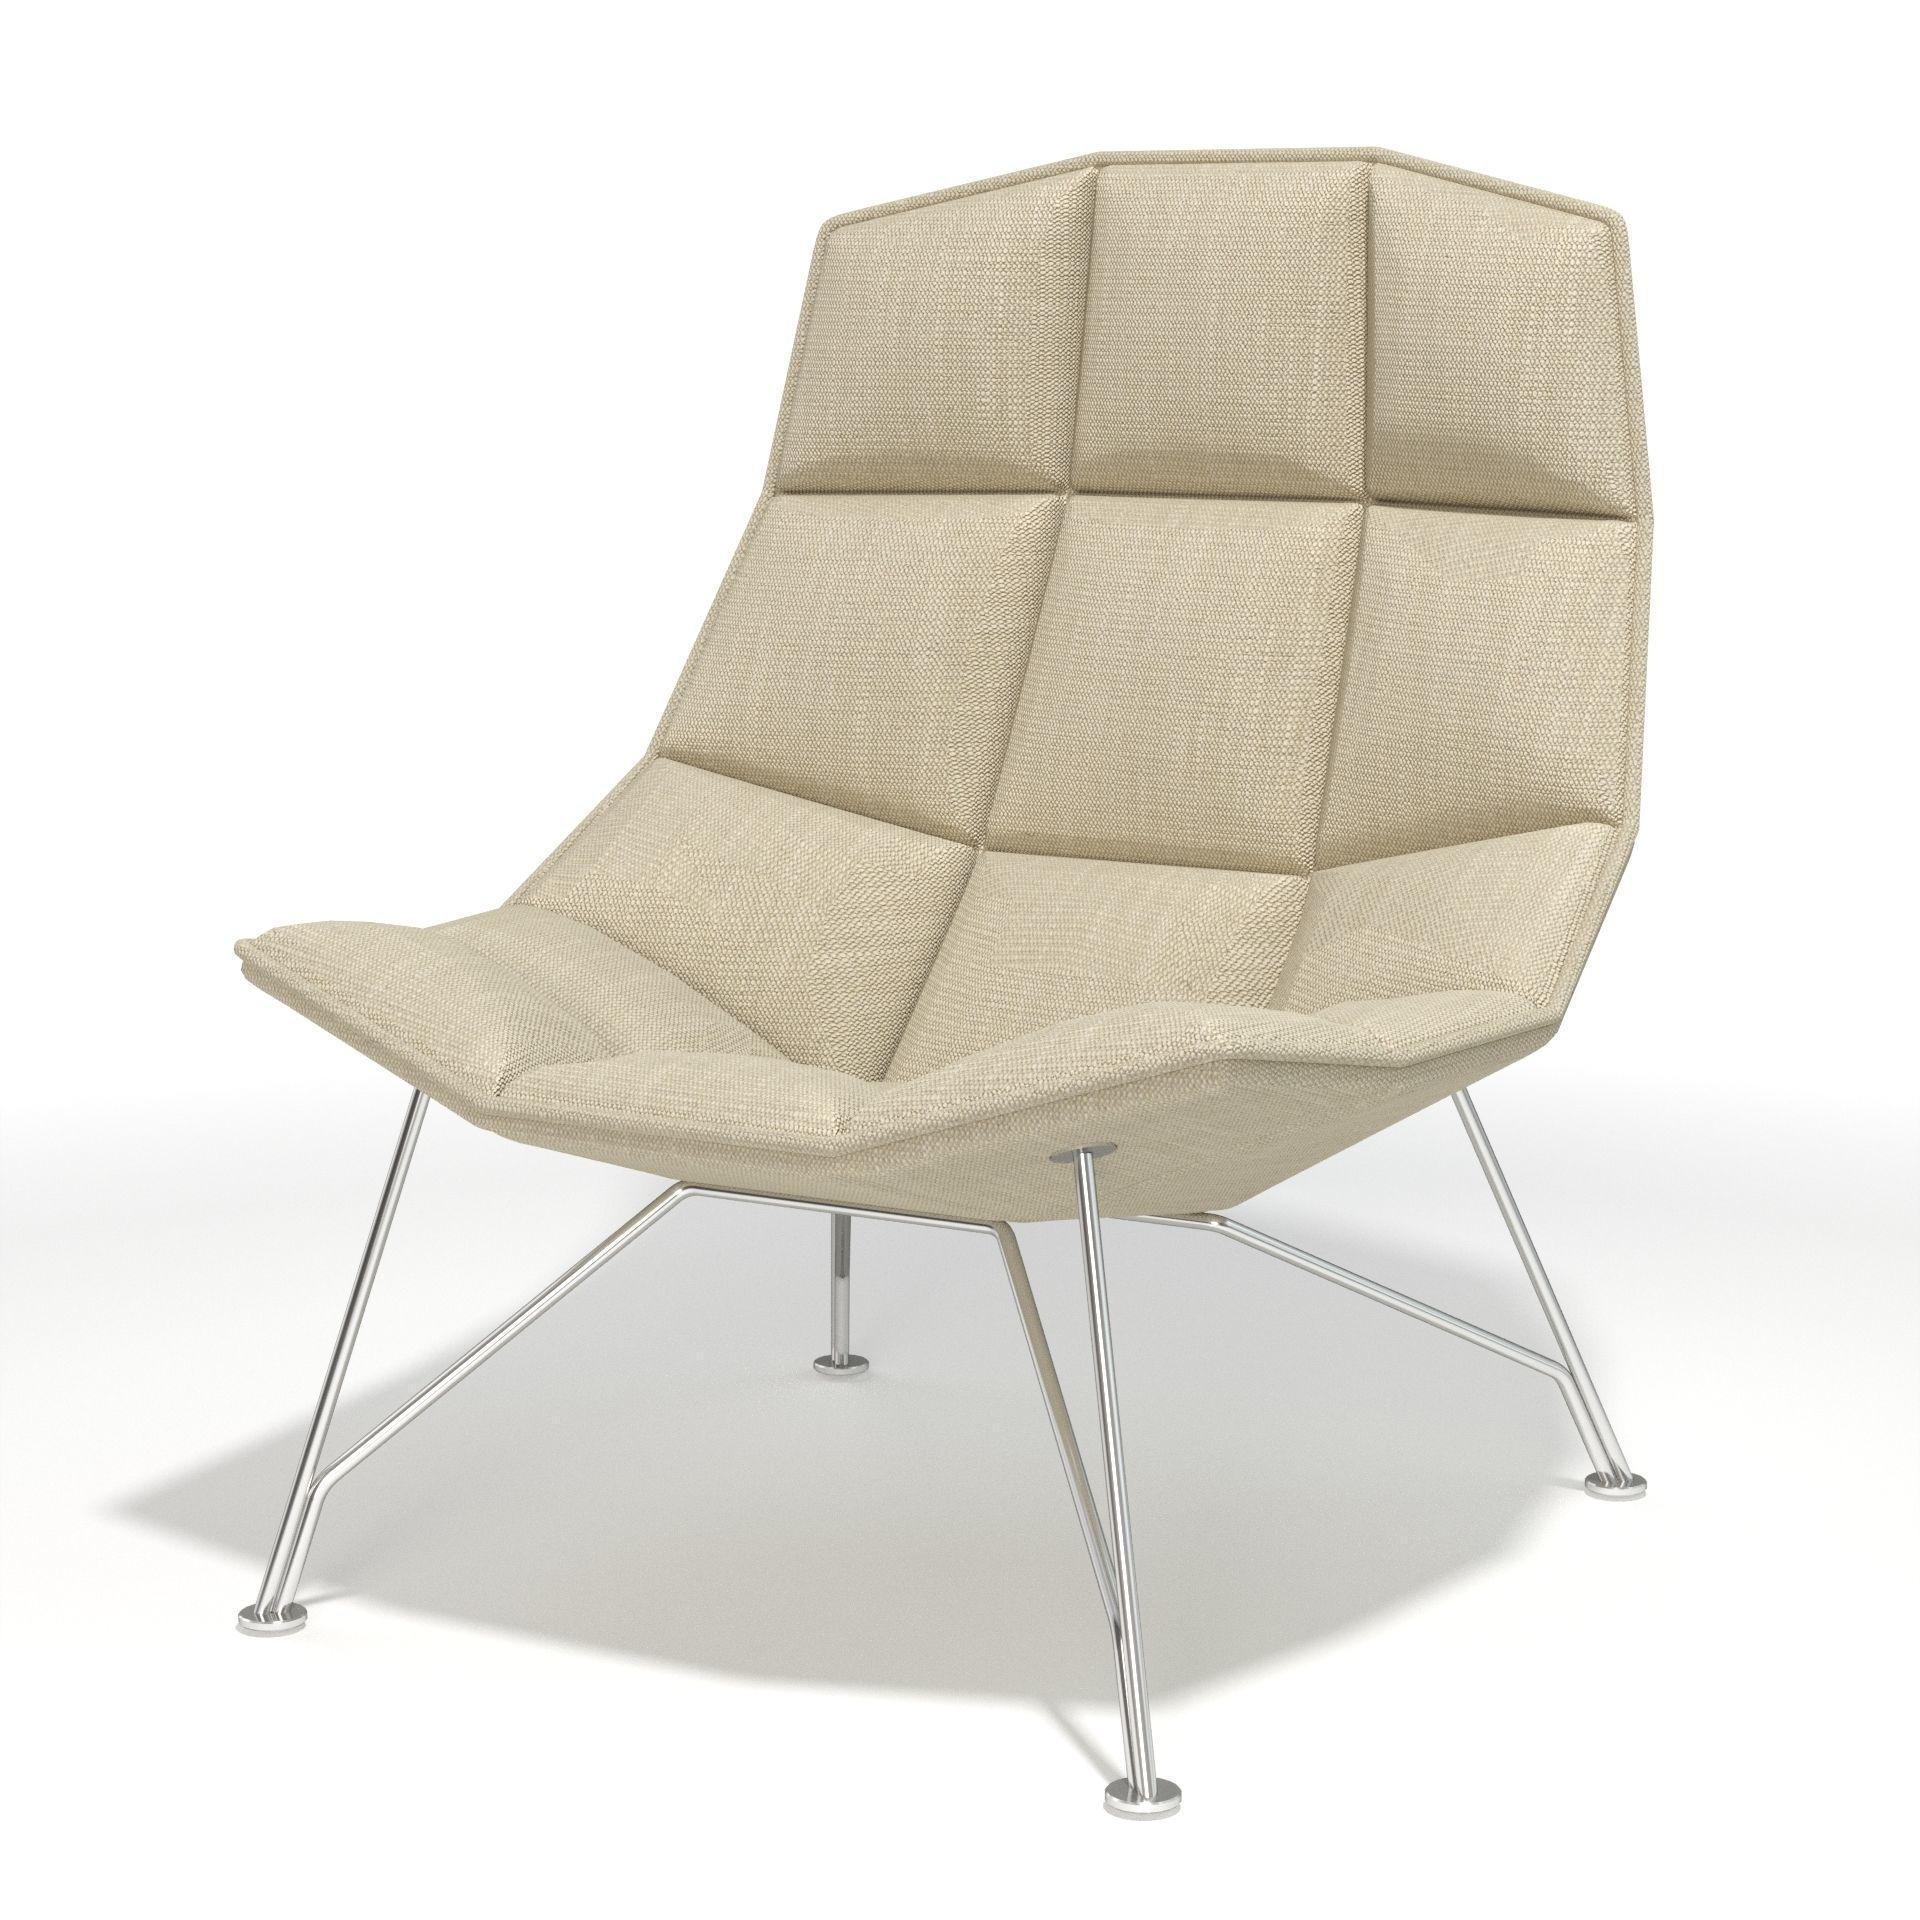 jehs laub lounge chair deschutes red 3d model and cgtrader max obj mtl fbx 5